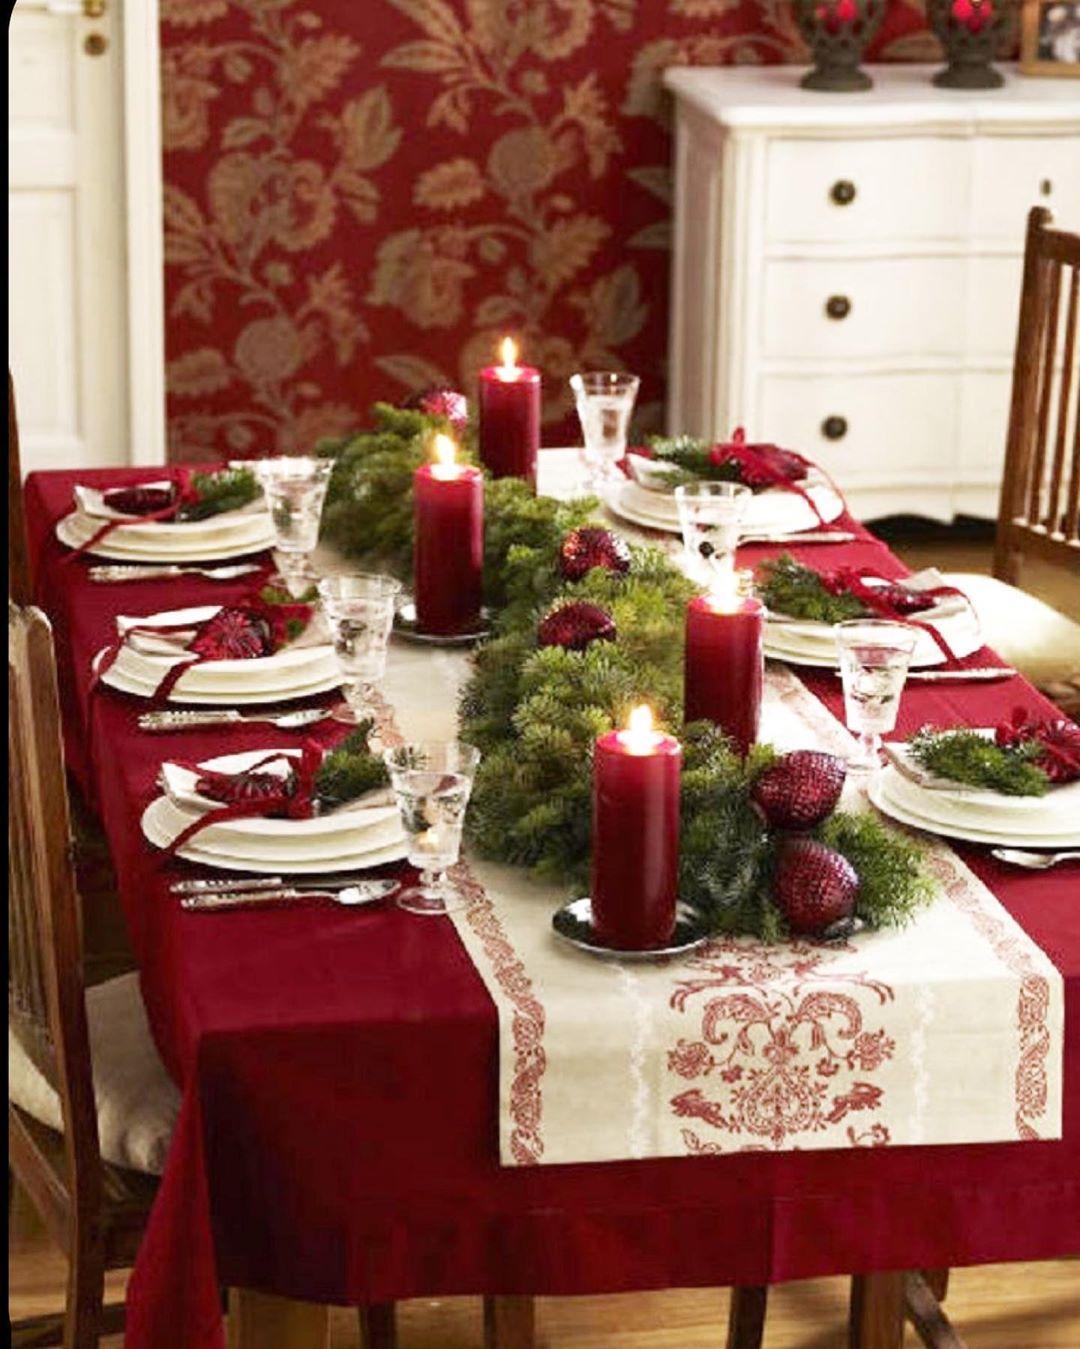 Christmas Christmas Dining Table Christmas Table Decorations Christmas Centerpieces